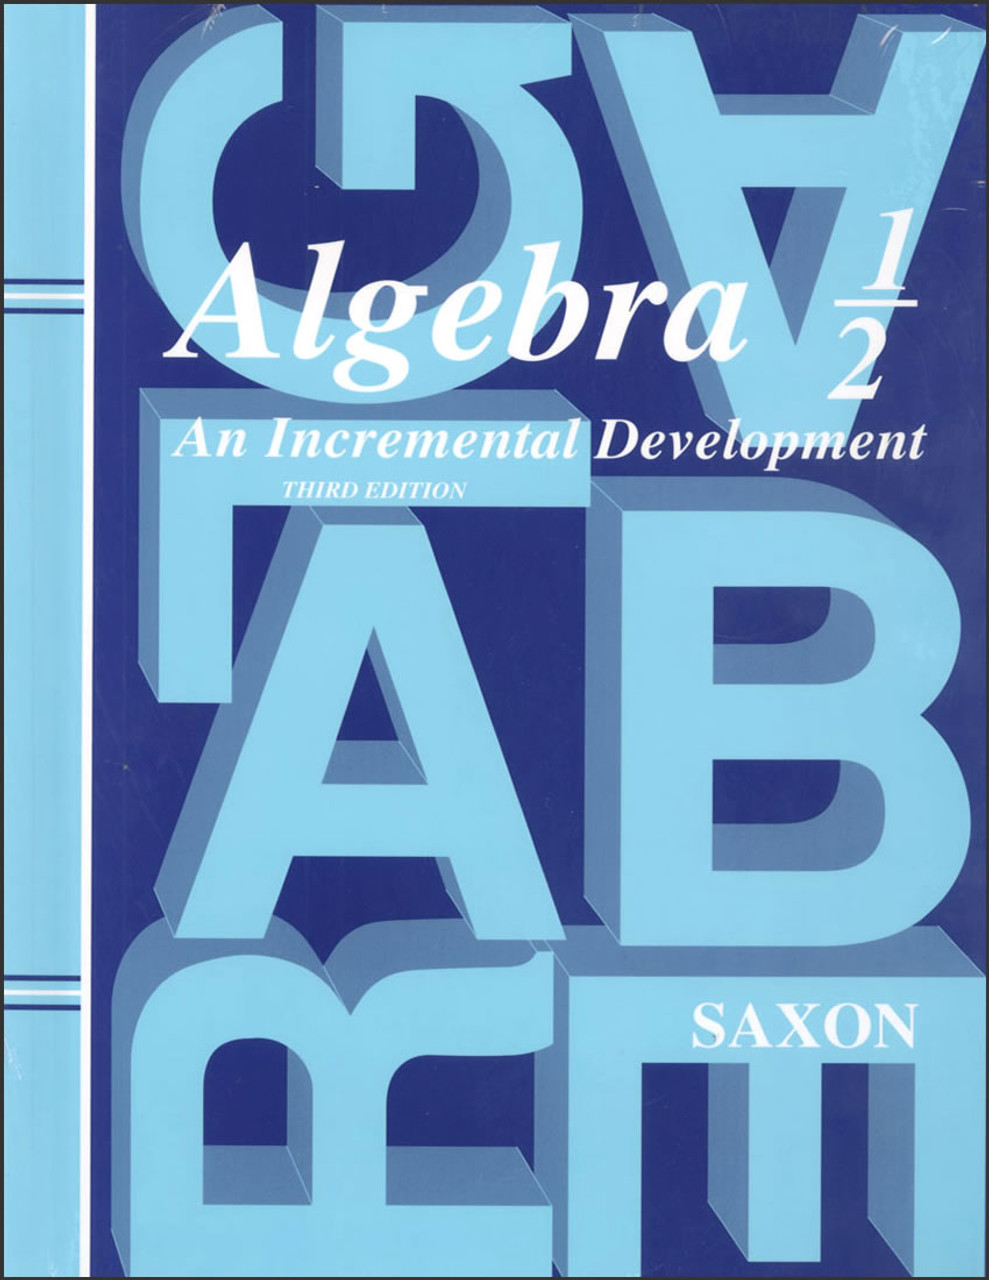 Saxon Algebra 1/2, 3rd edition - Home Study Kit